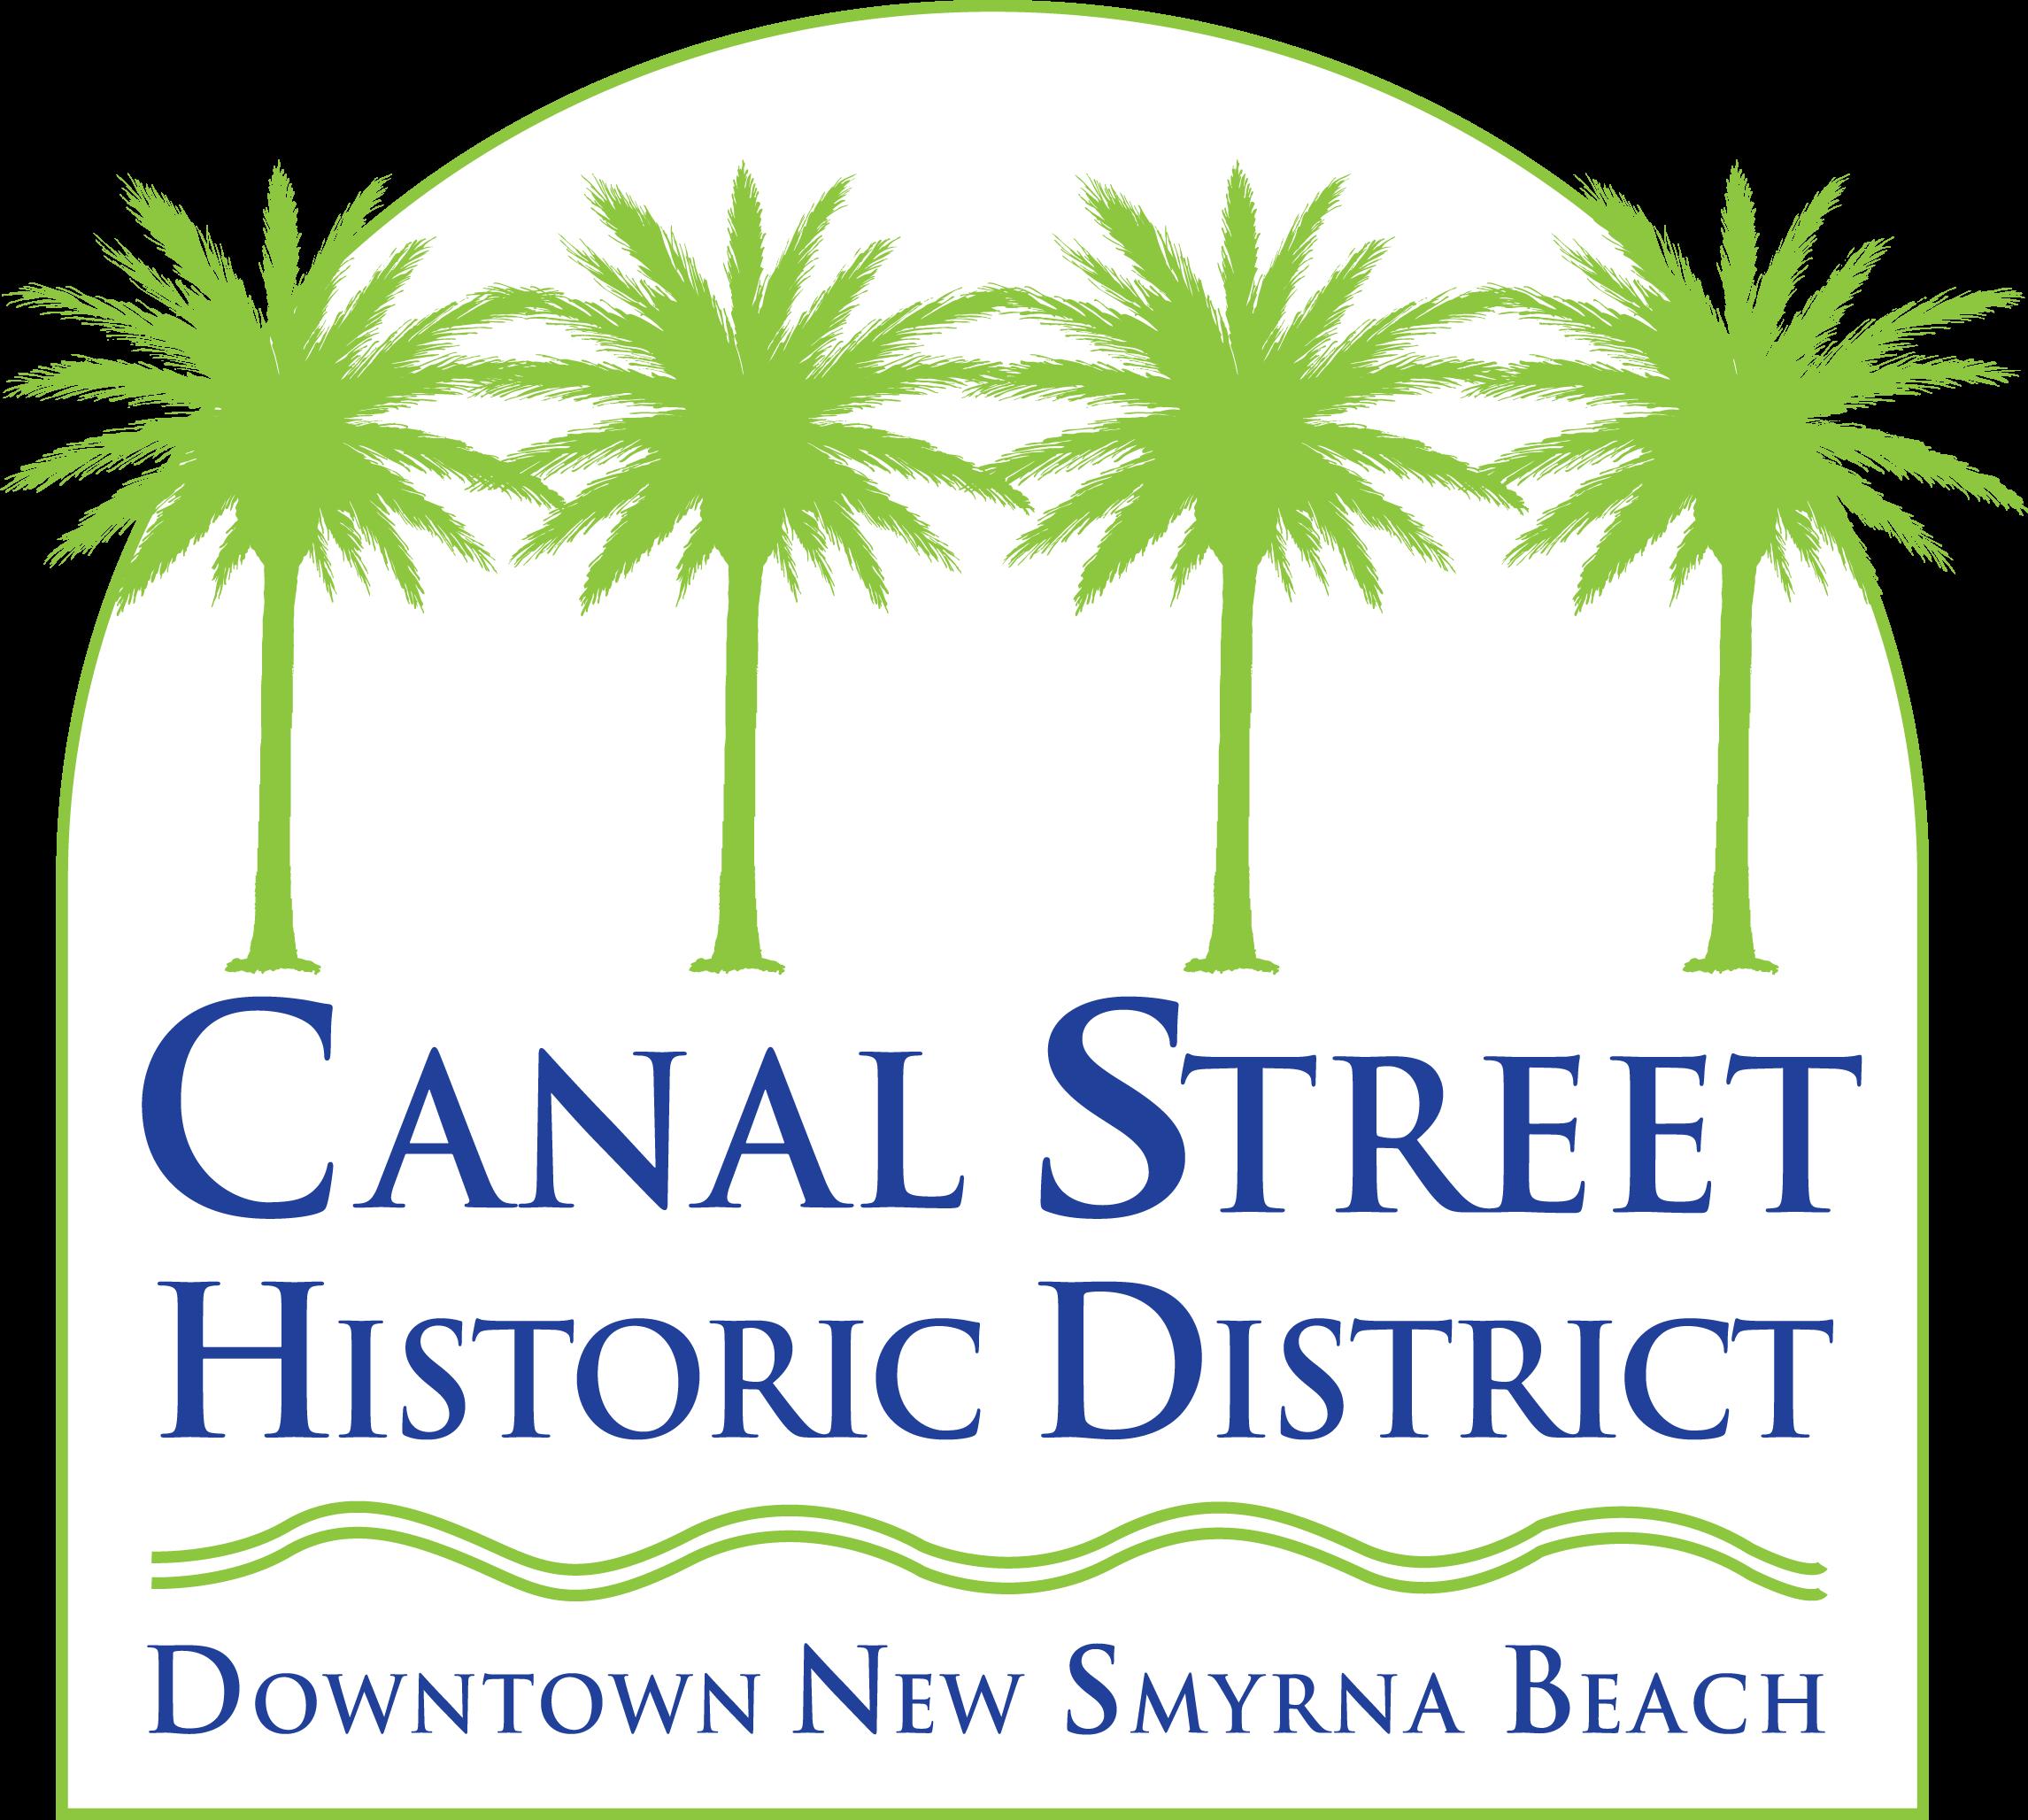 Smyrna Christmas Parade 2019 Don't Miss the 2019 Christmas Boat Parade in New Smyrna Beach